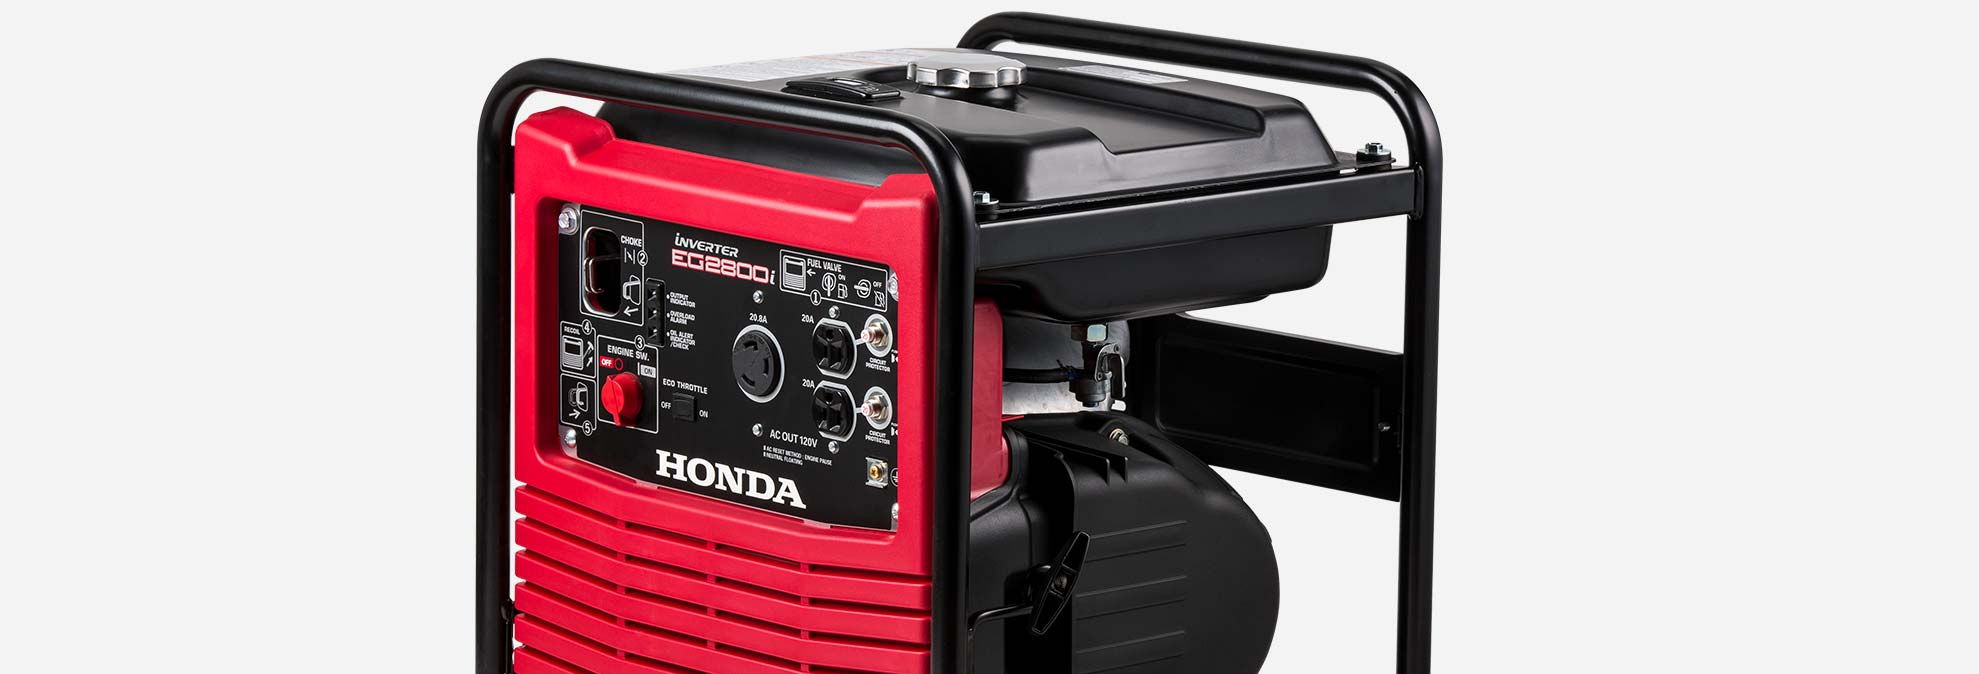 Honda Recalls 34,000 Inverter Generators - Consumer Reports